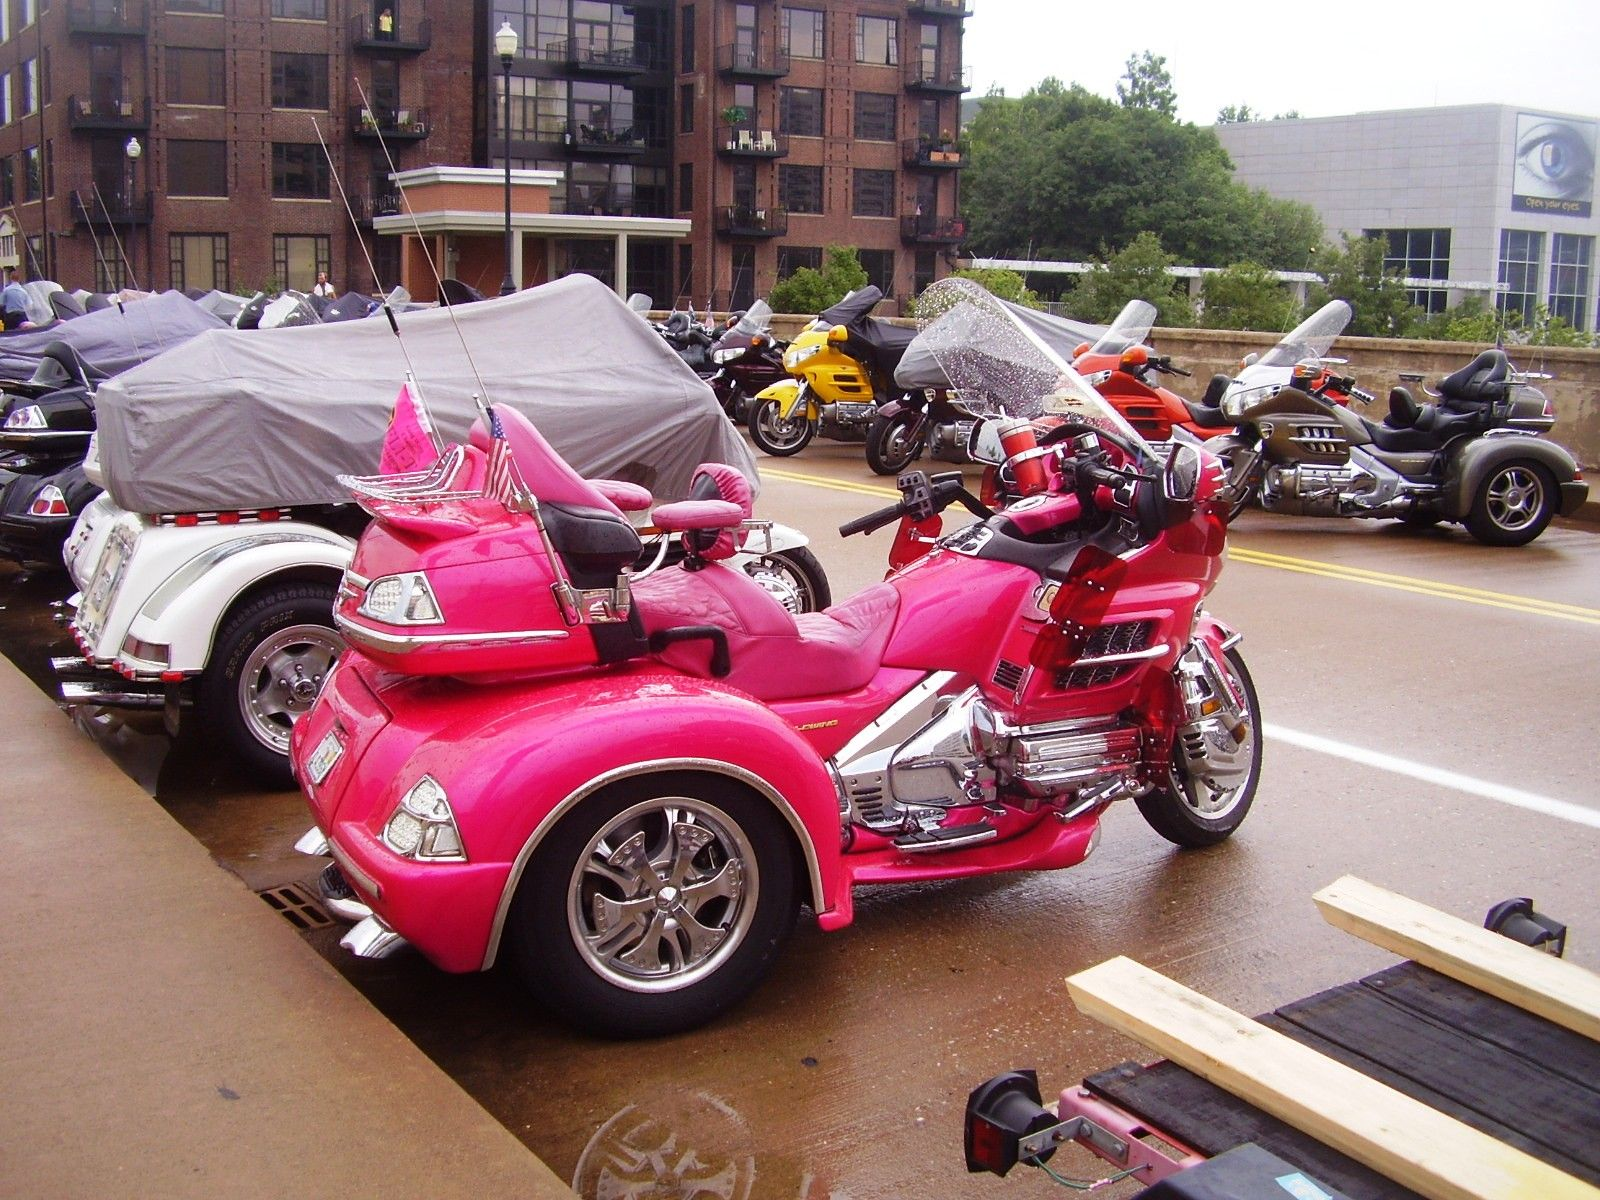 trike motorcycles pink sandi motorcycle honda goldwing harley davidson trikes purple chick trailer cars thepurpleturtle journey bad bikes af vroom